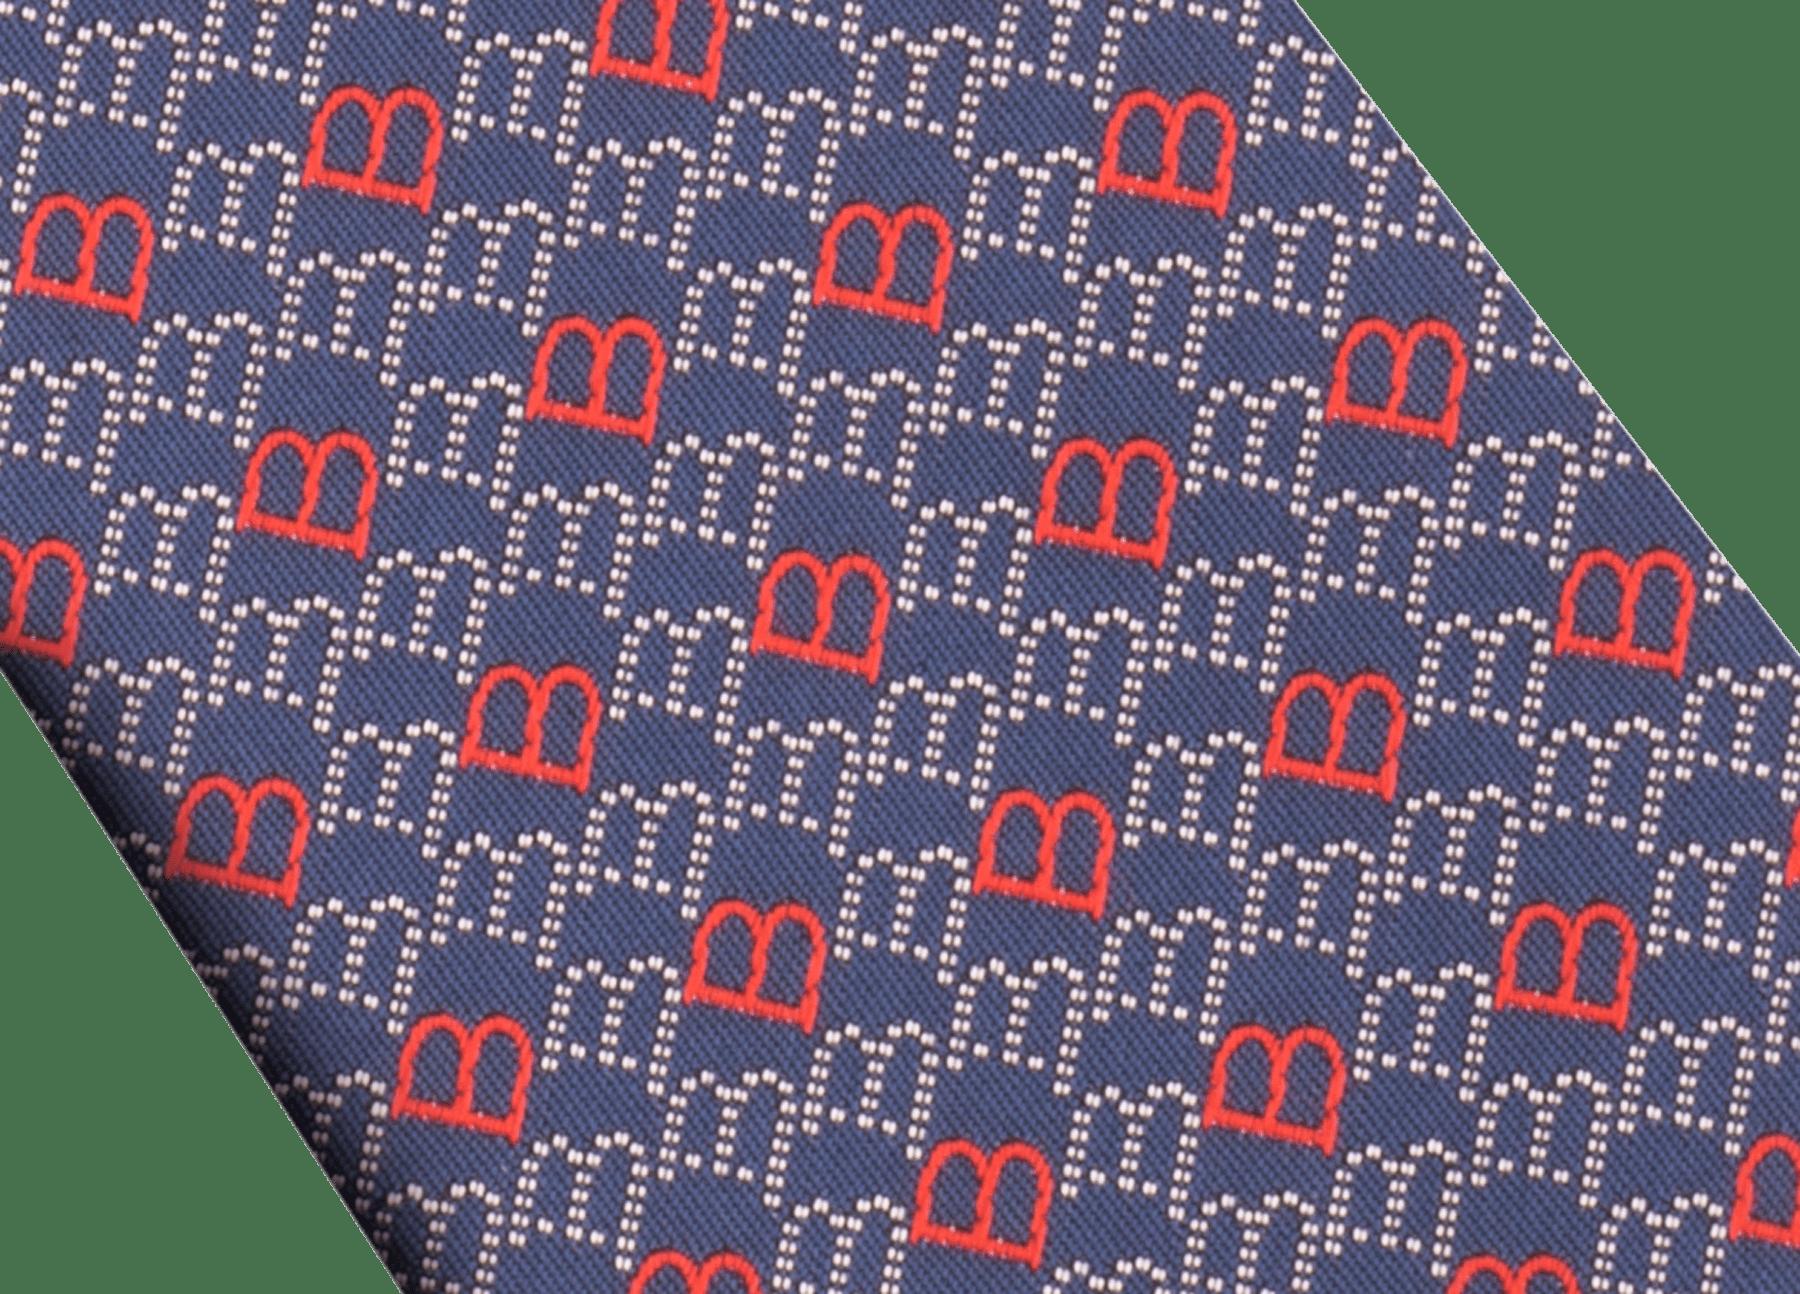 Corbata de siete pliegues azul marino en seda de jacquard fina Logo B Point. 244390 image 2